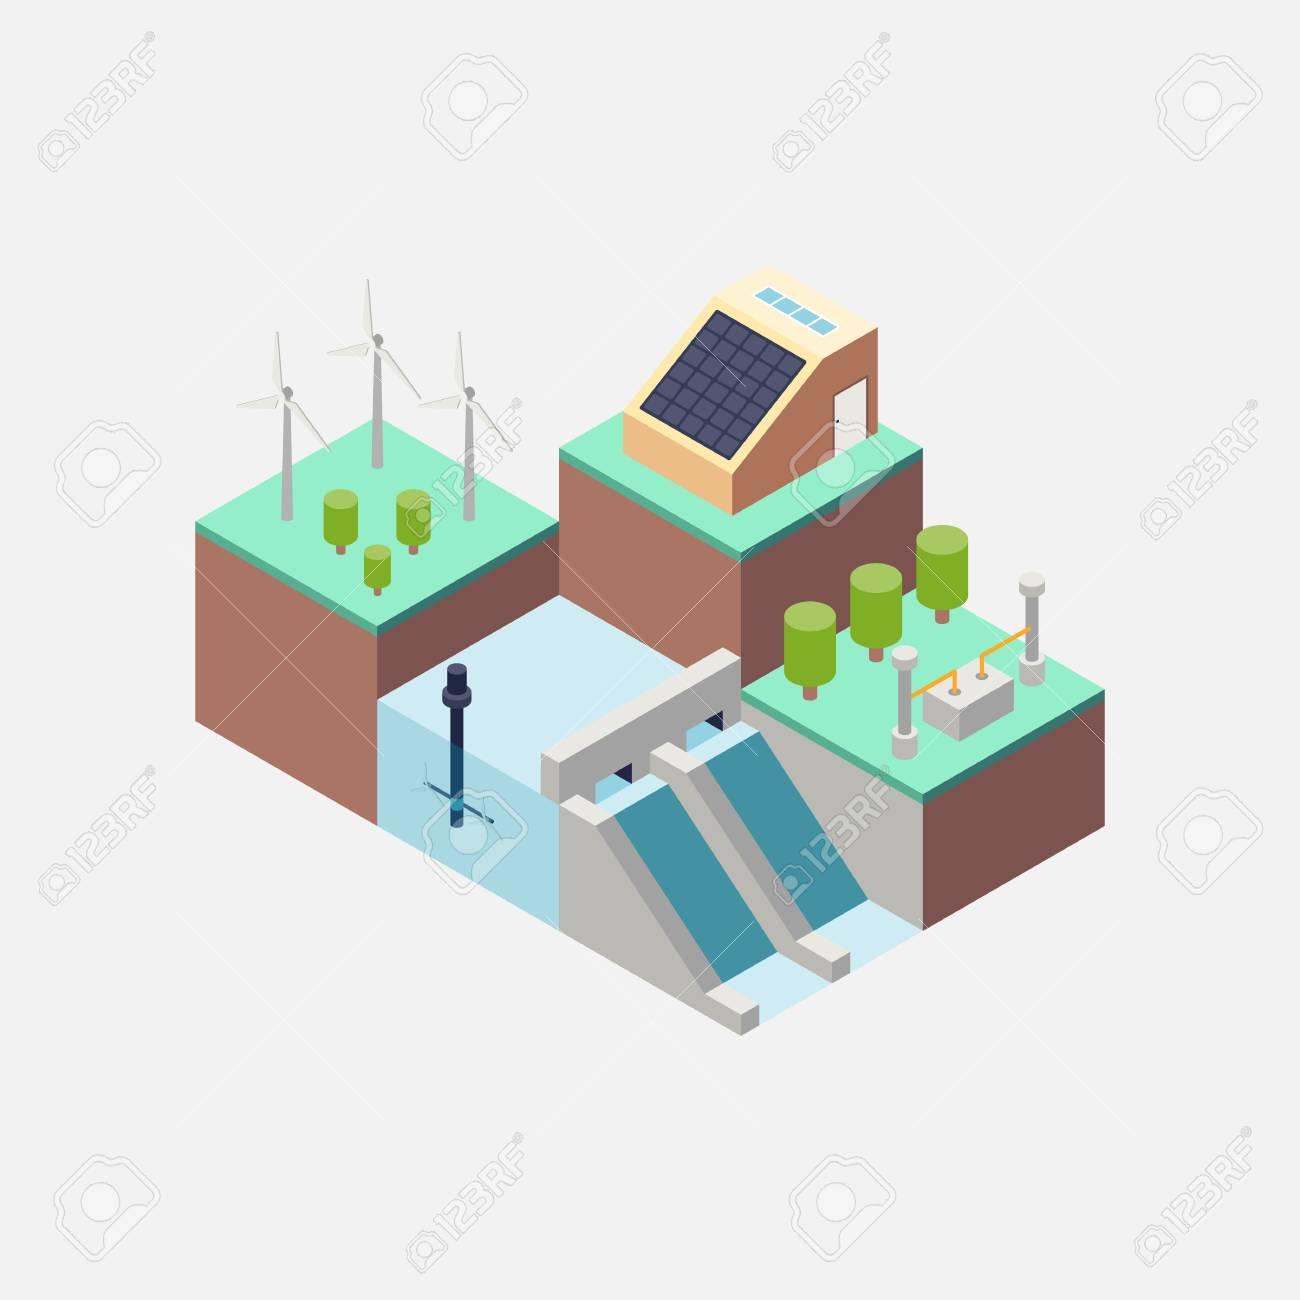 Renewable energy concept flat design, vector illustration - 82938307